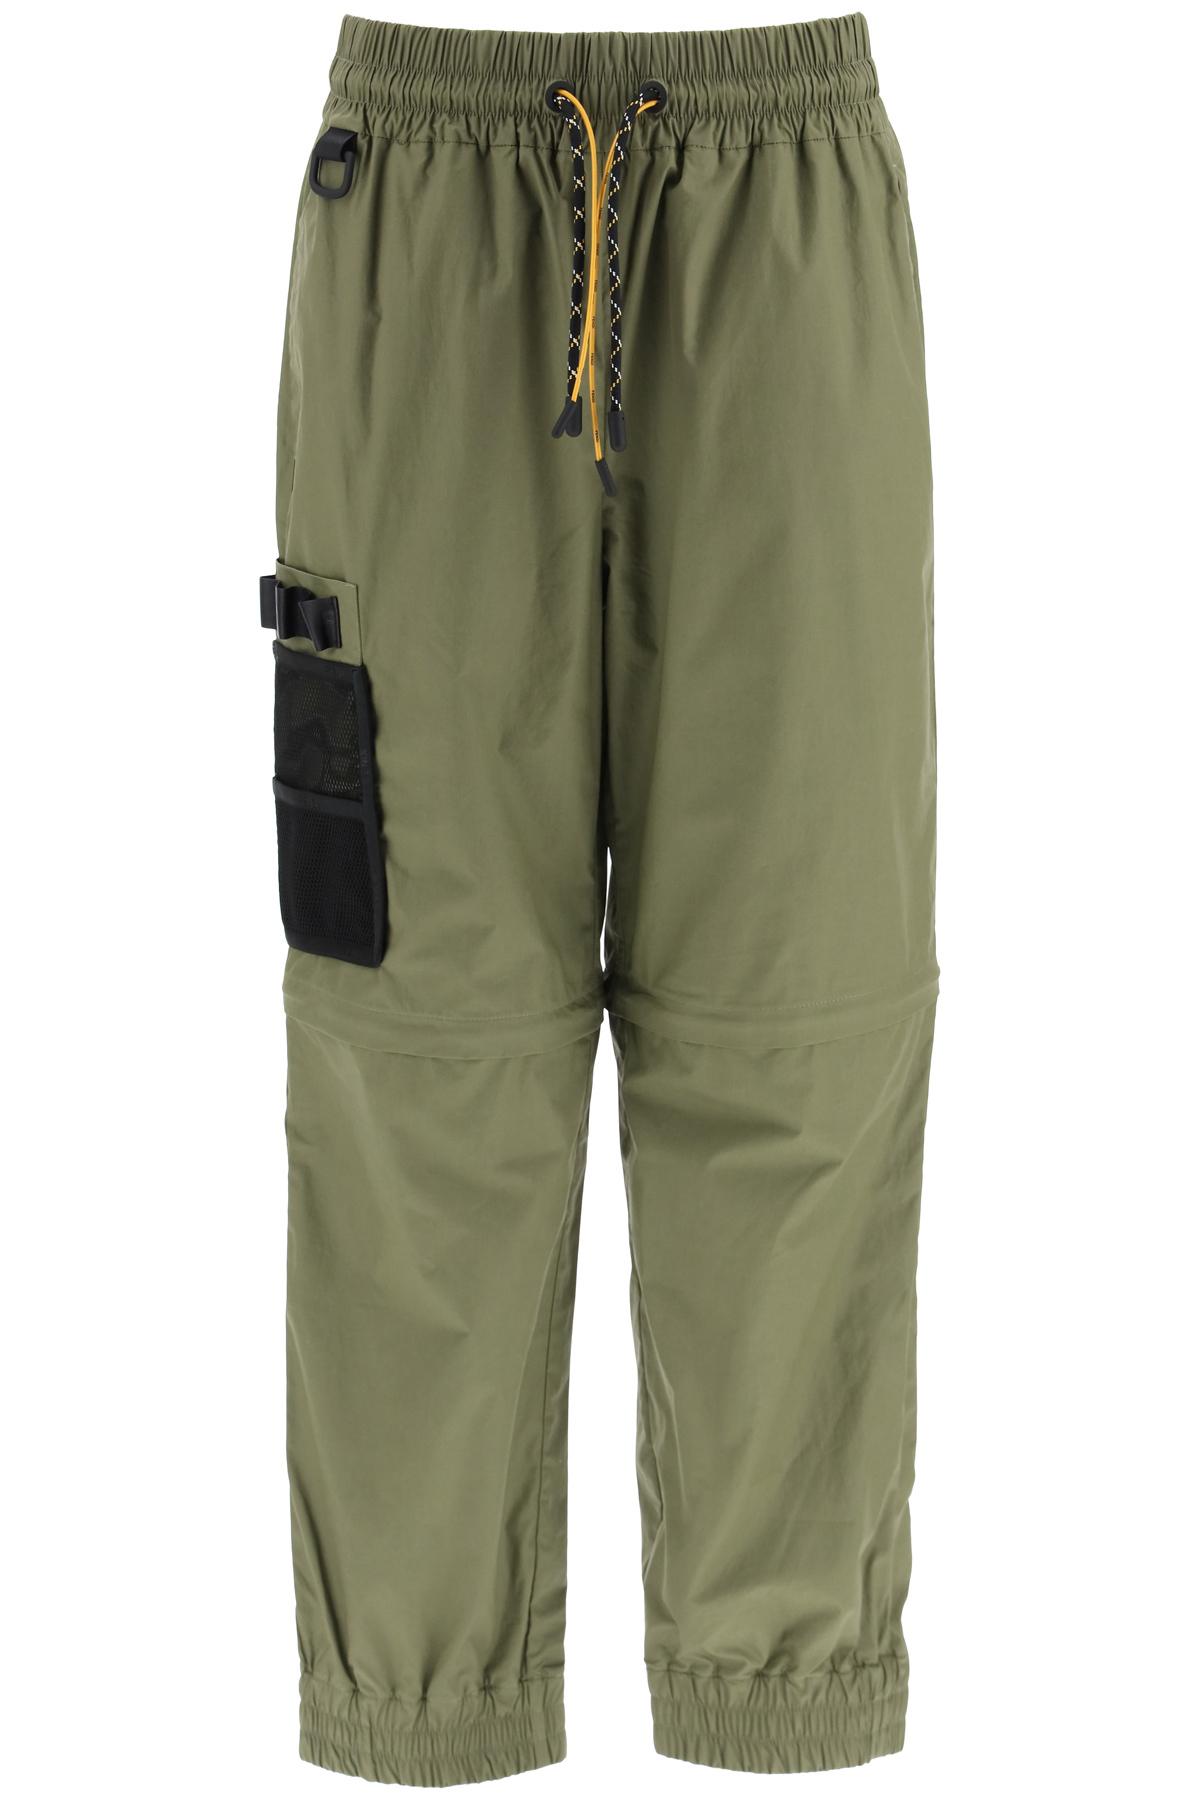 Fendi pantaloni jogging con tasca in mesh